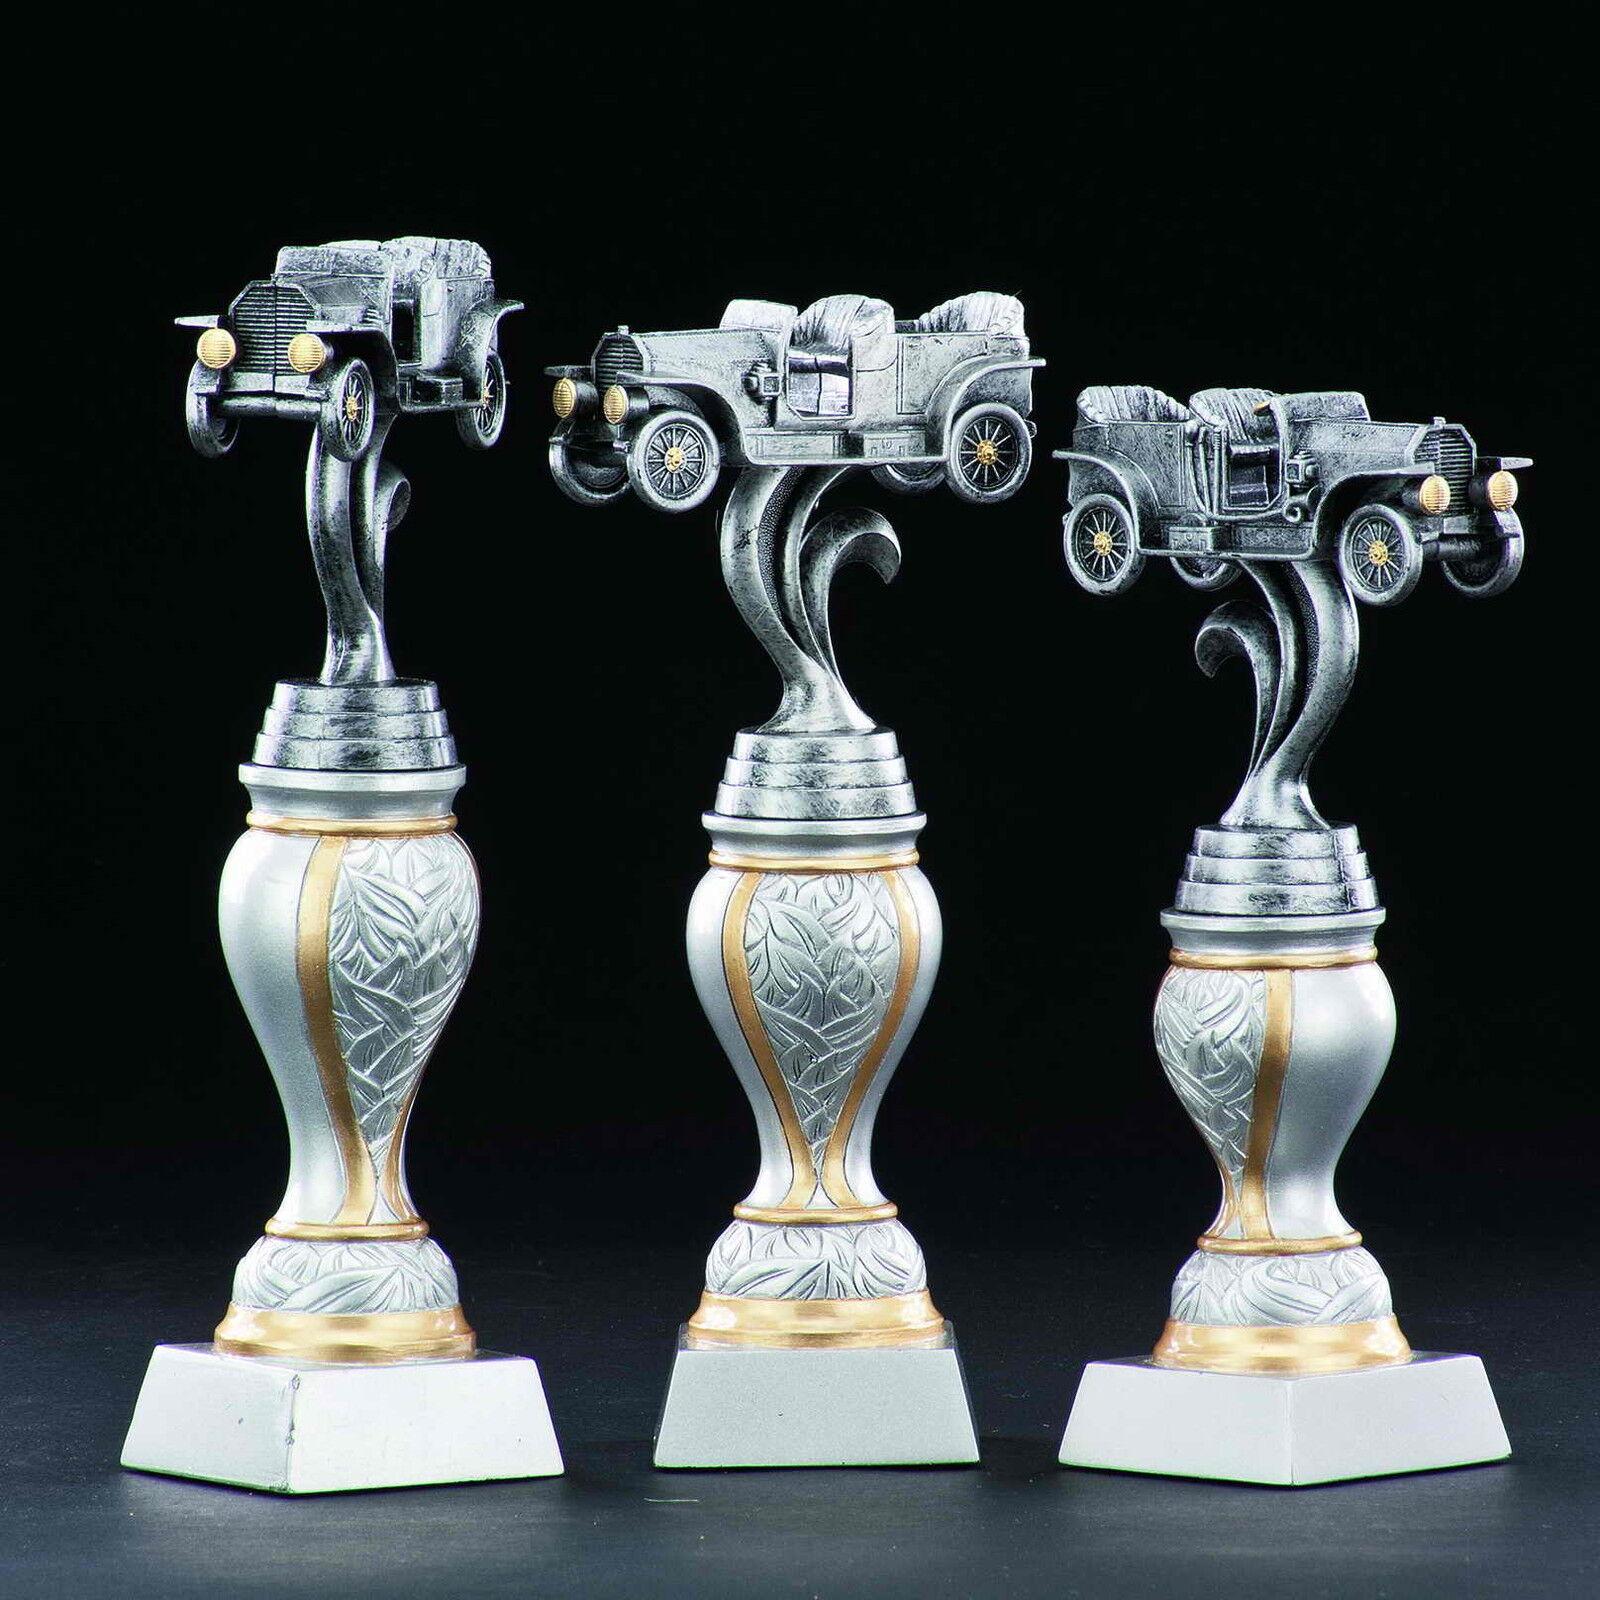 Motorsport 2x3er serie personaggi TRATTORE AGRICOLTURA  k209 premiazioni medaglie